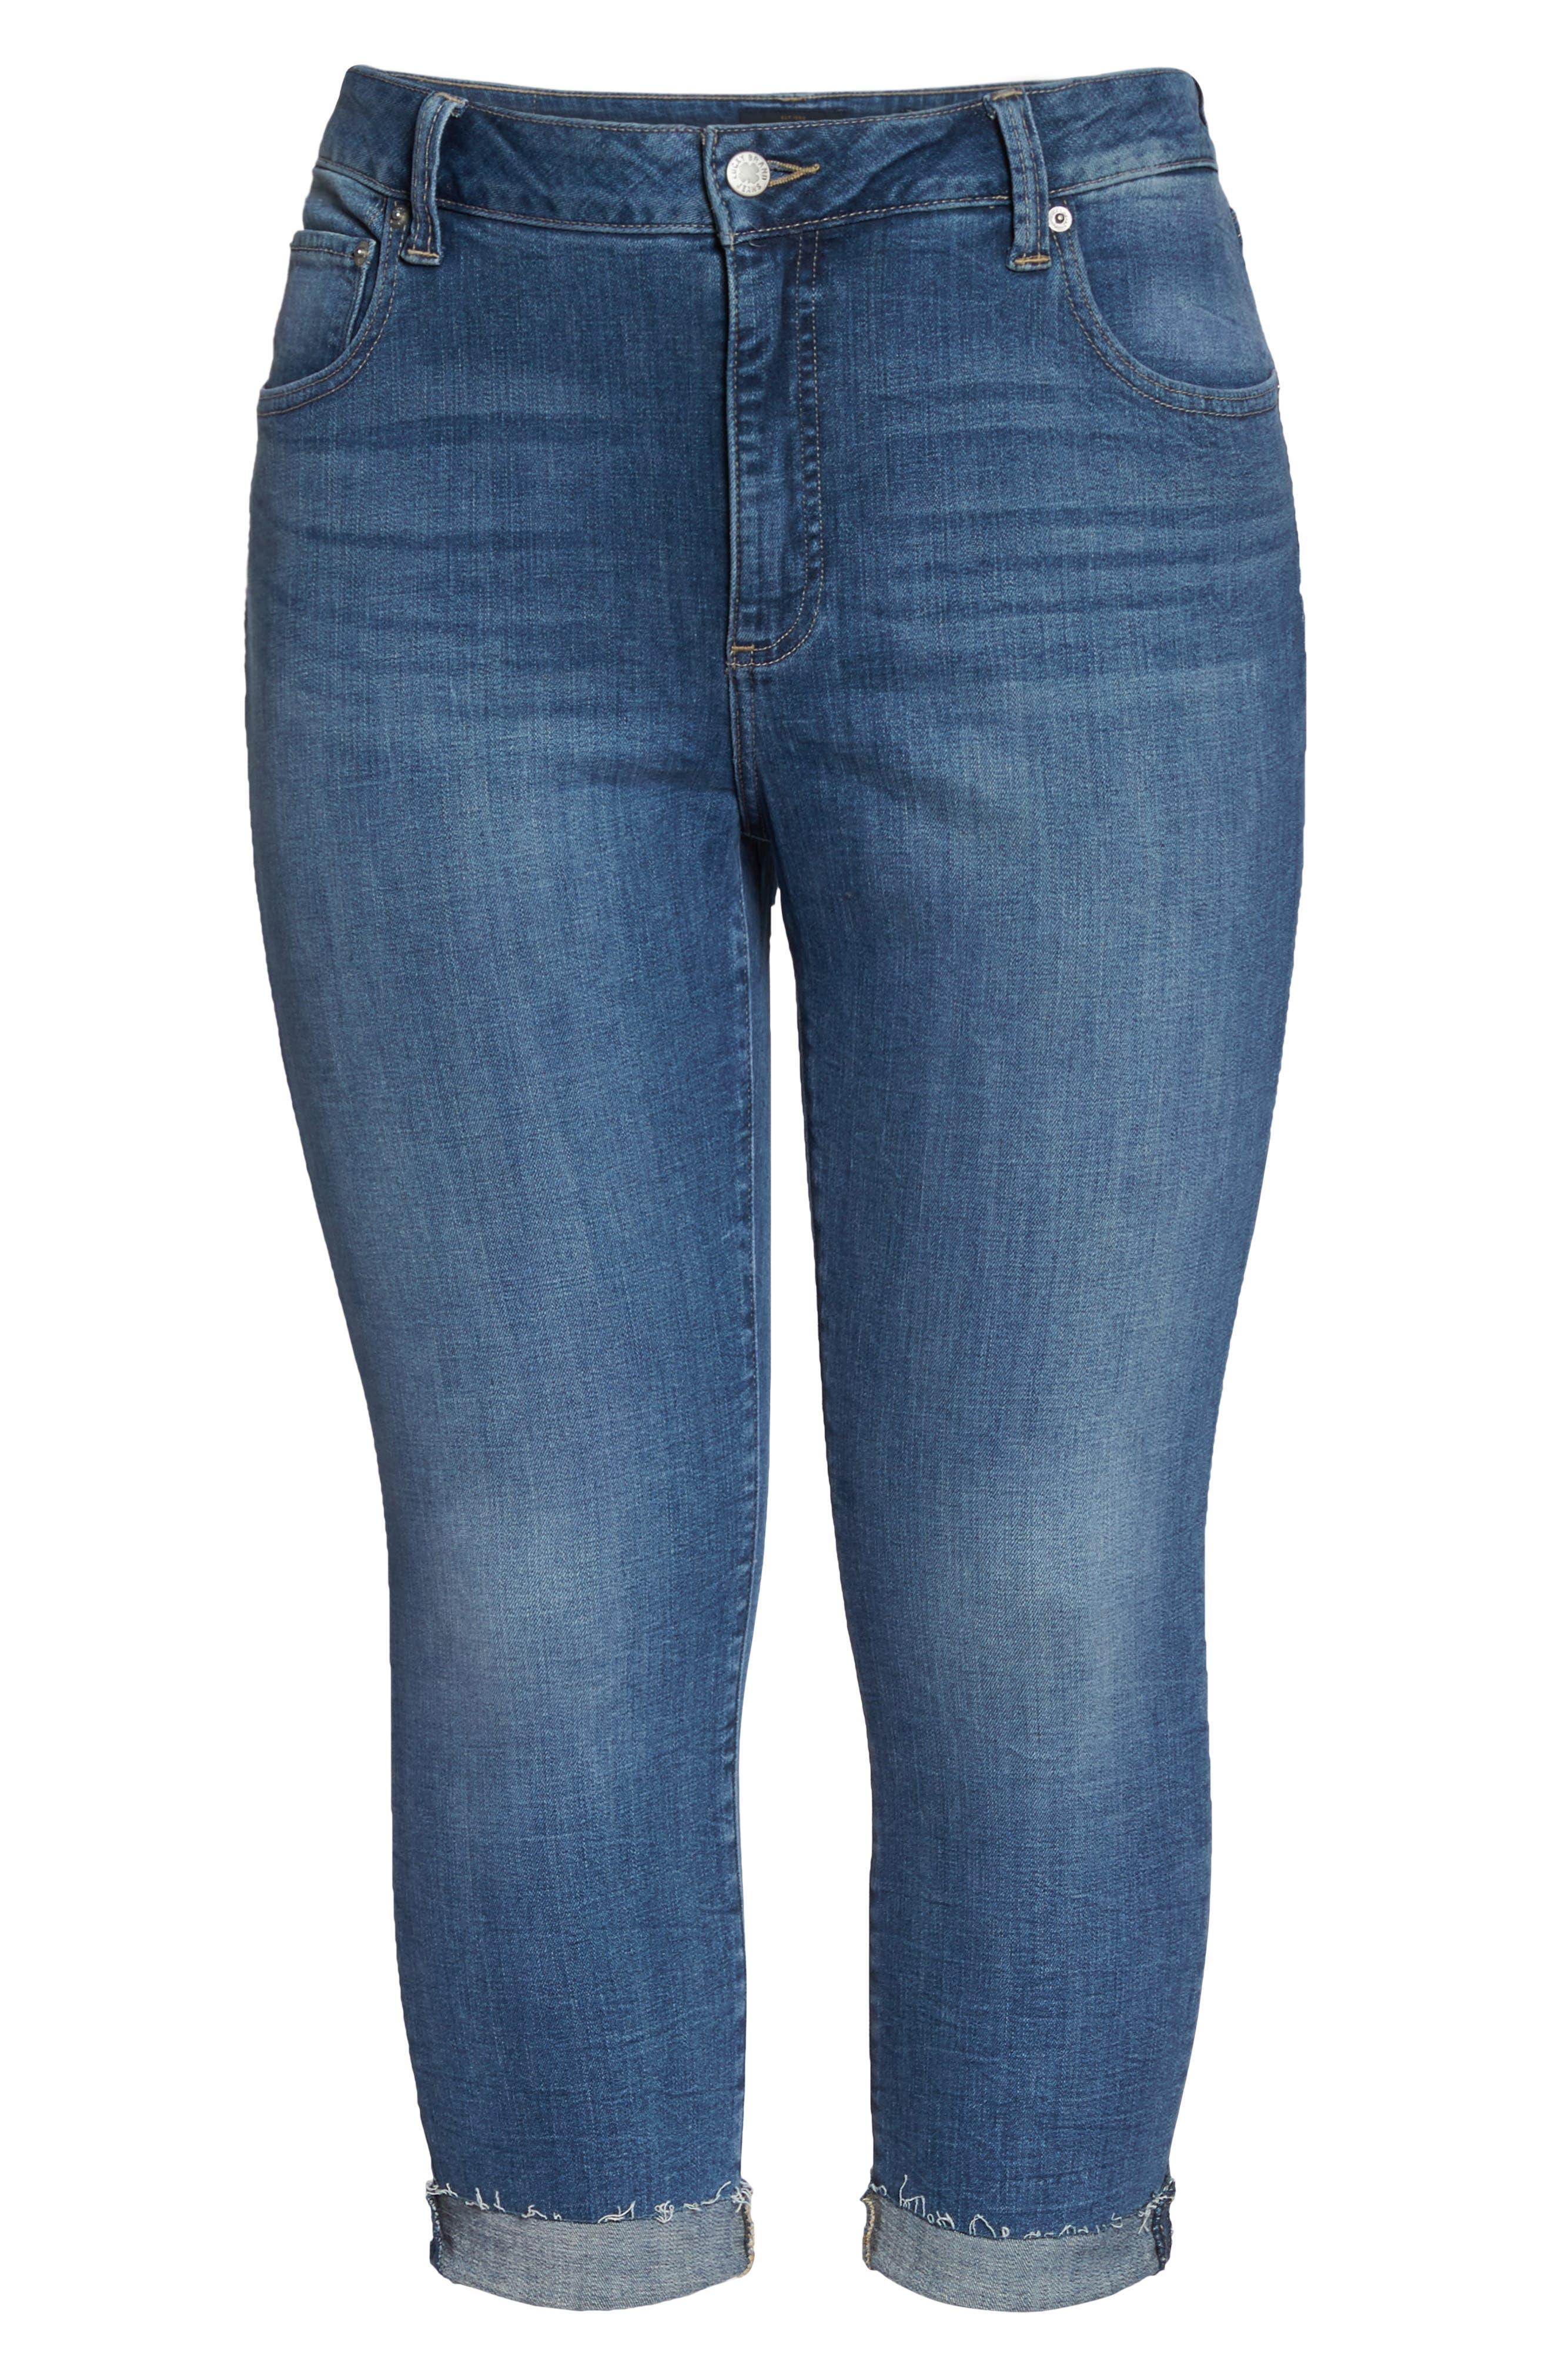 Emma Crop Skinny Jeans,                             Alternate thumbnail 7, color,                             Sunbeam-P